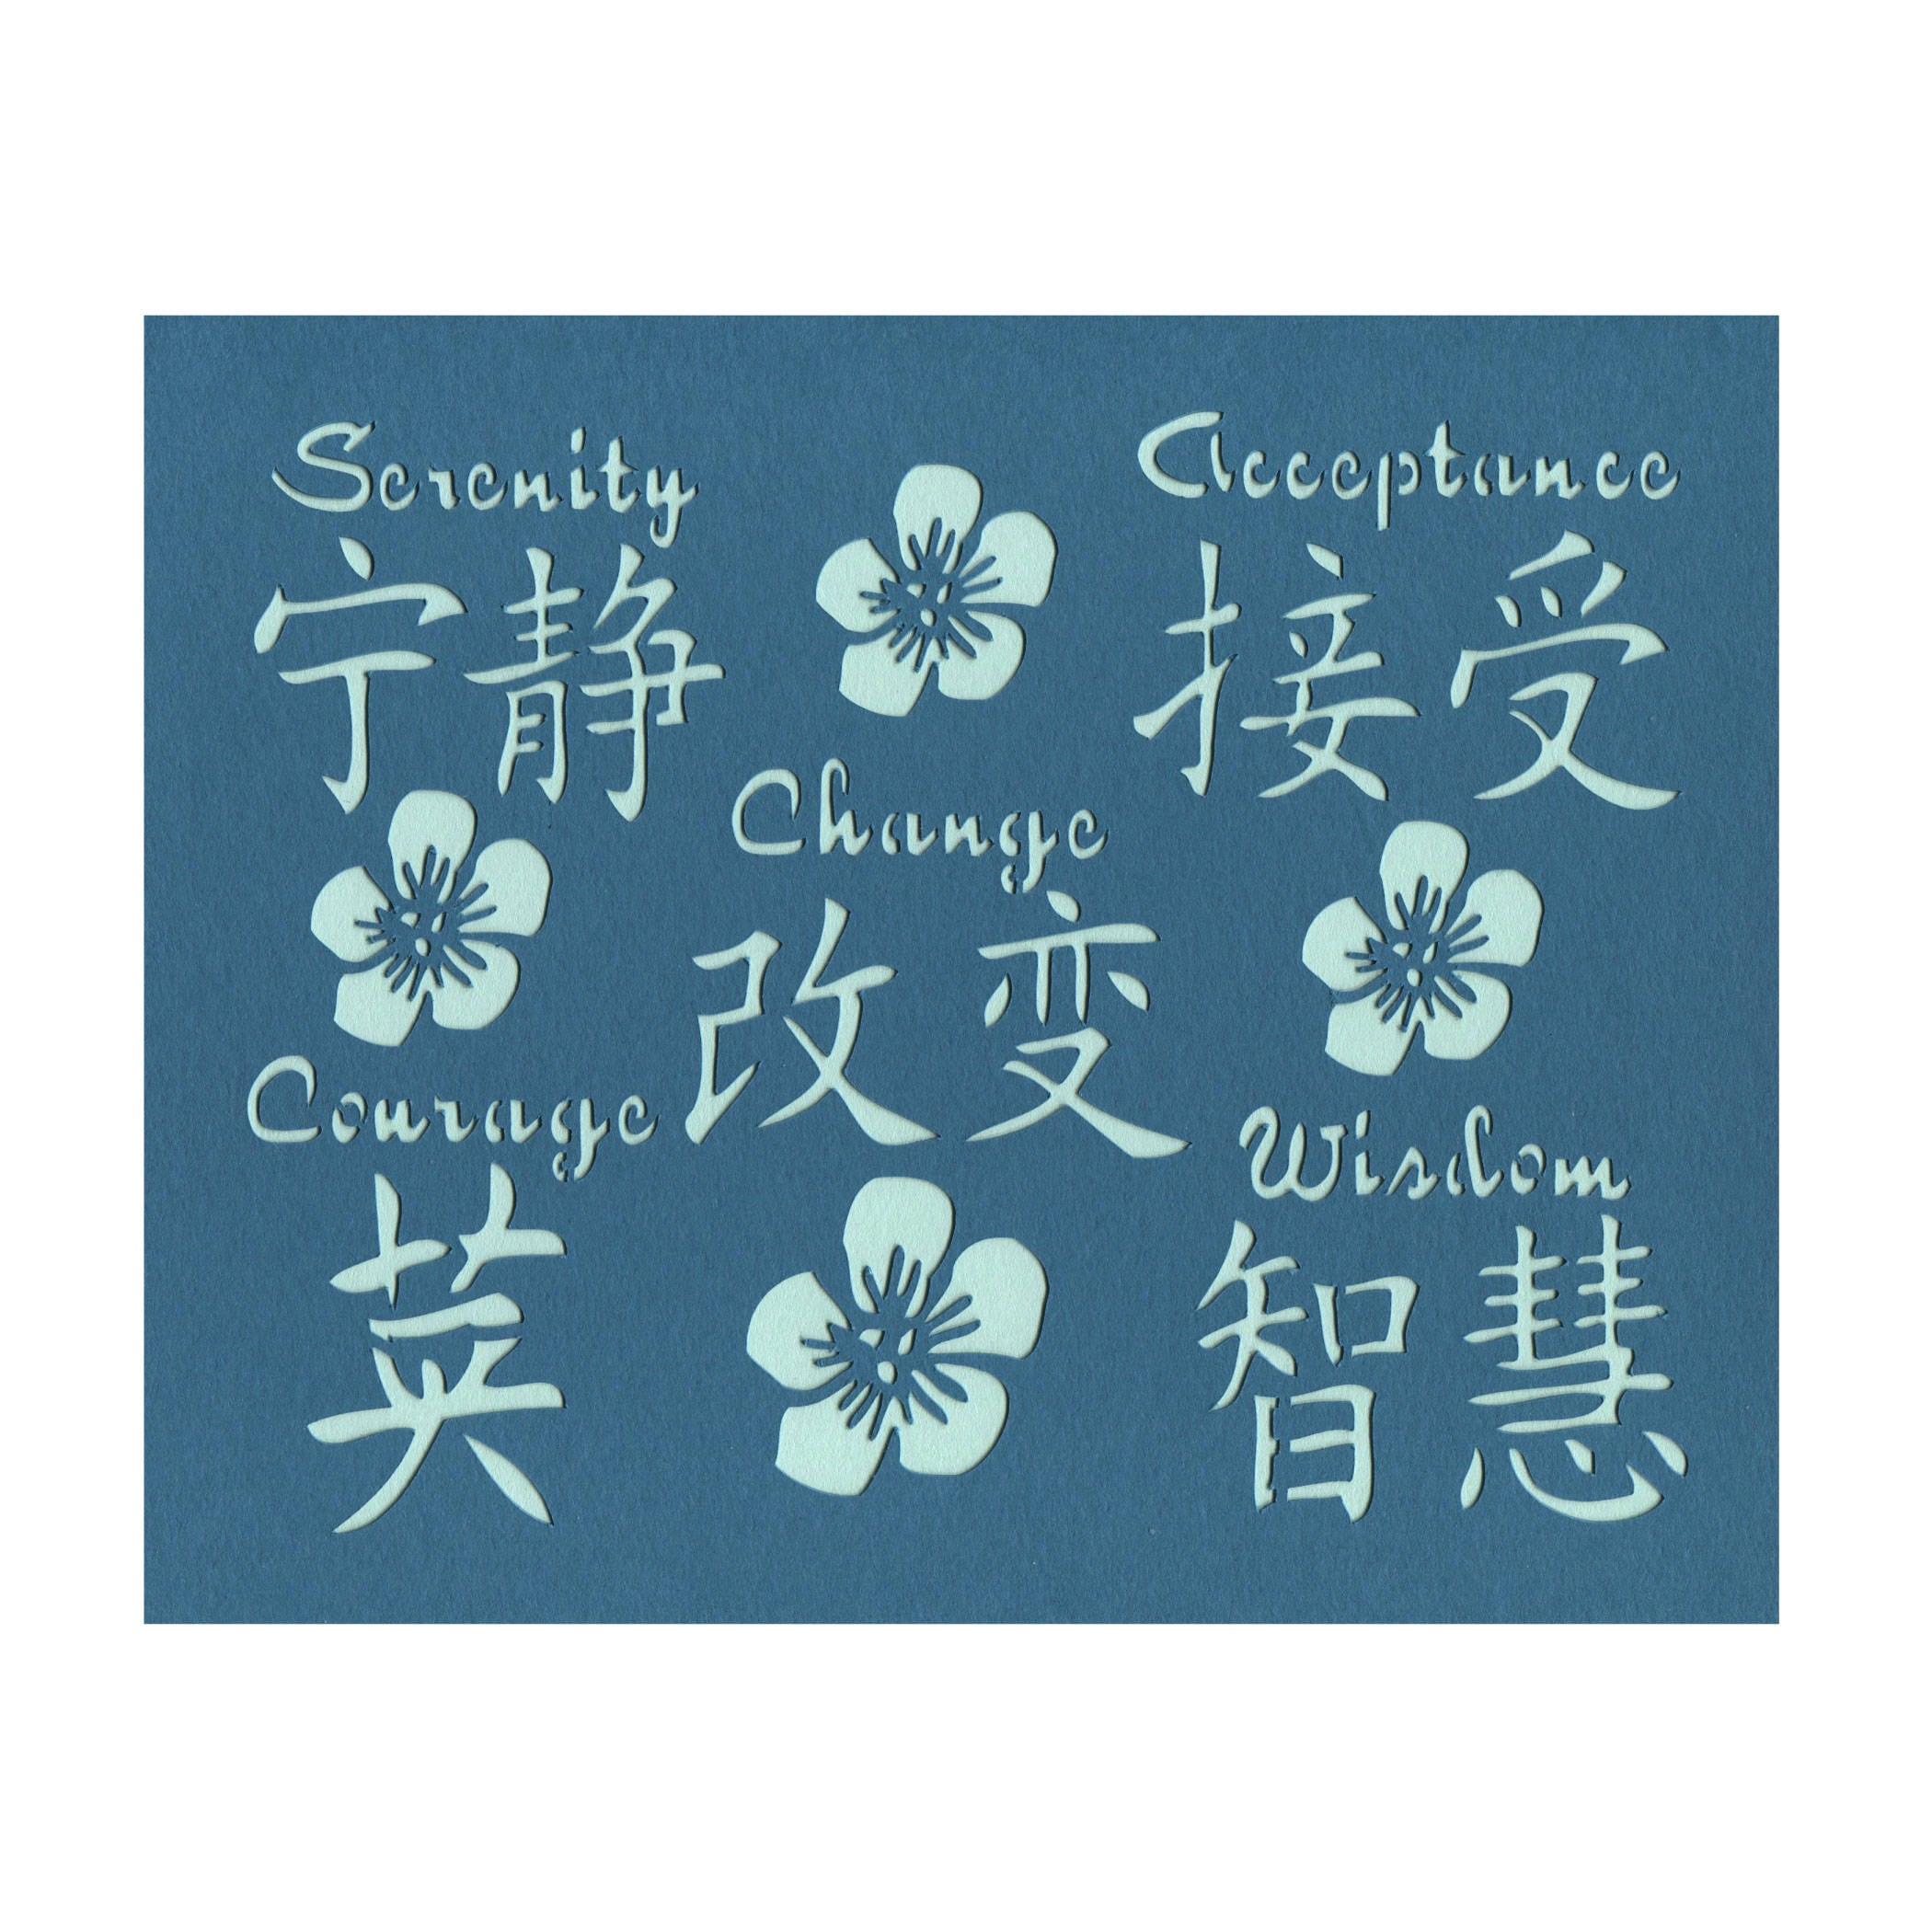 Serenity prayer in chinese symbols inspirational art wall art zoom buycottarizona Image collections